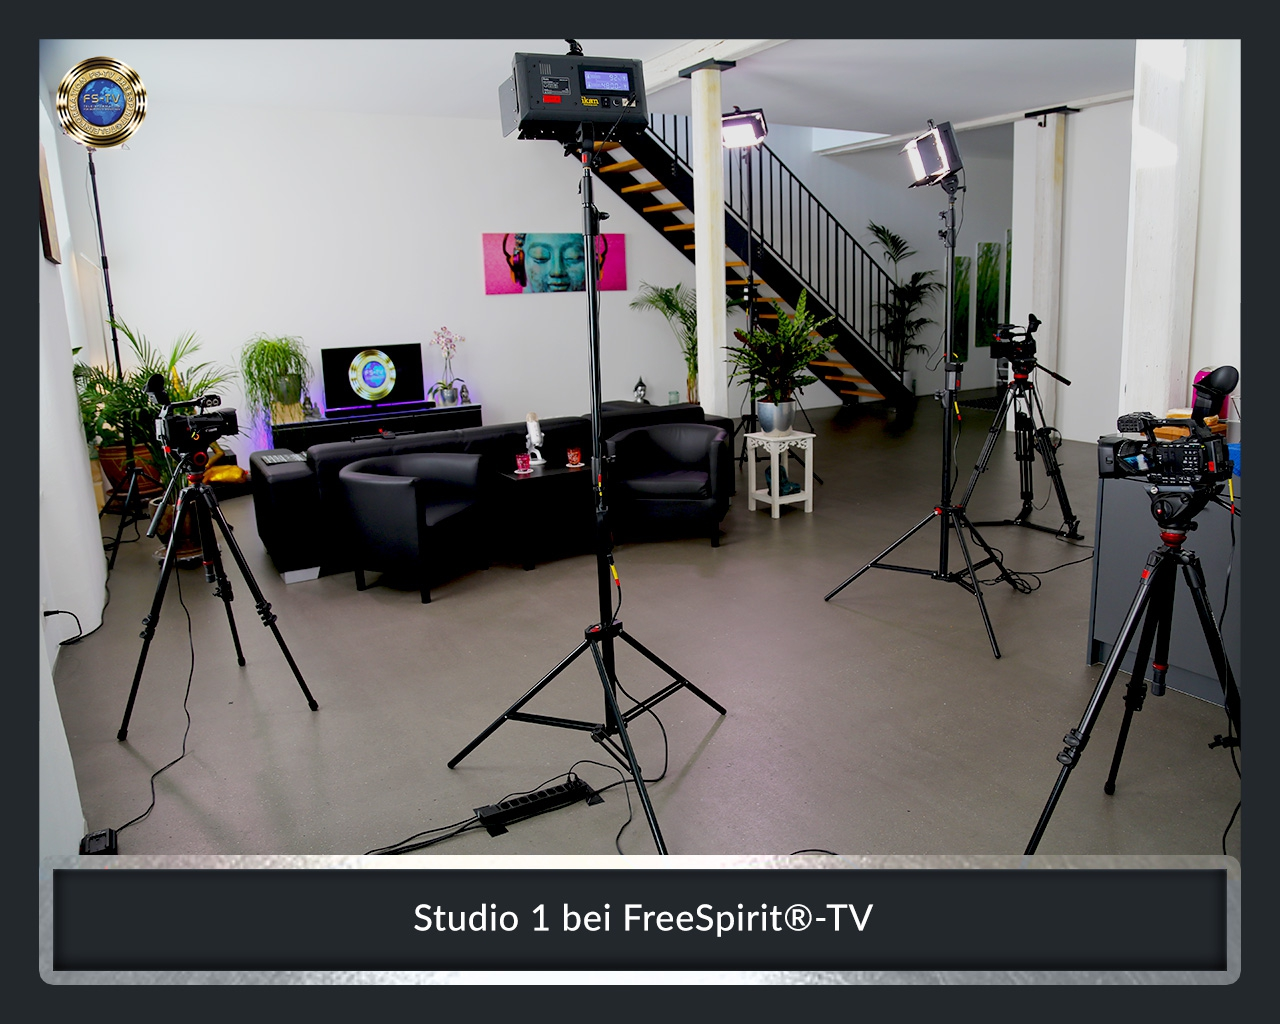 FS-TV-Bildergallerie-Studio-1